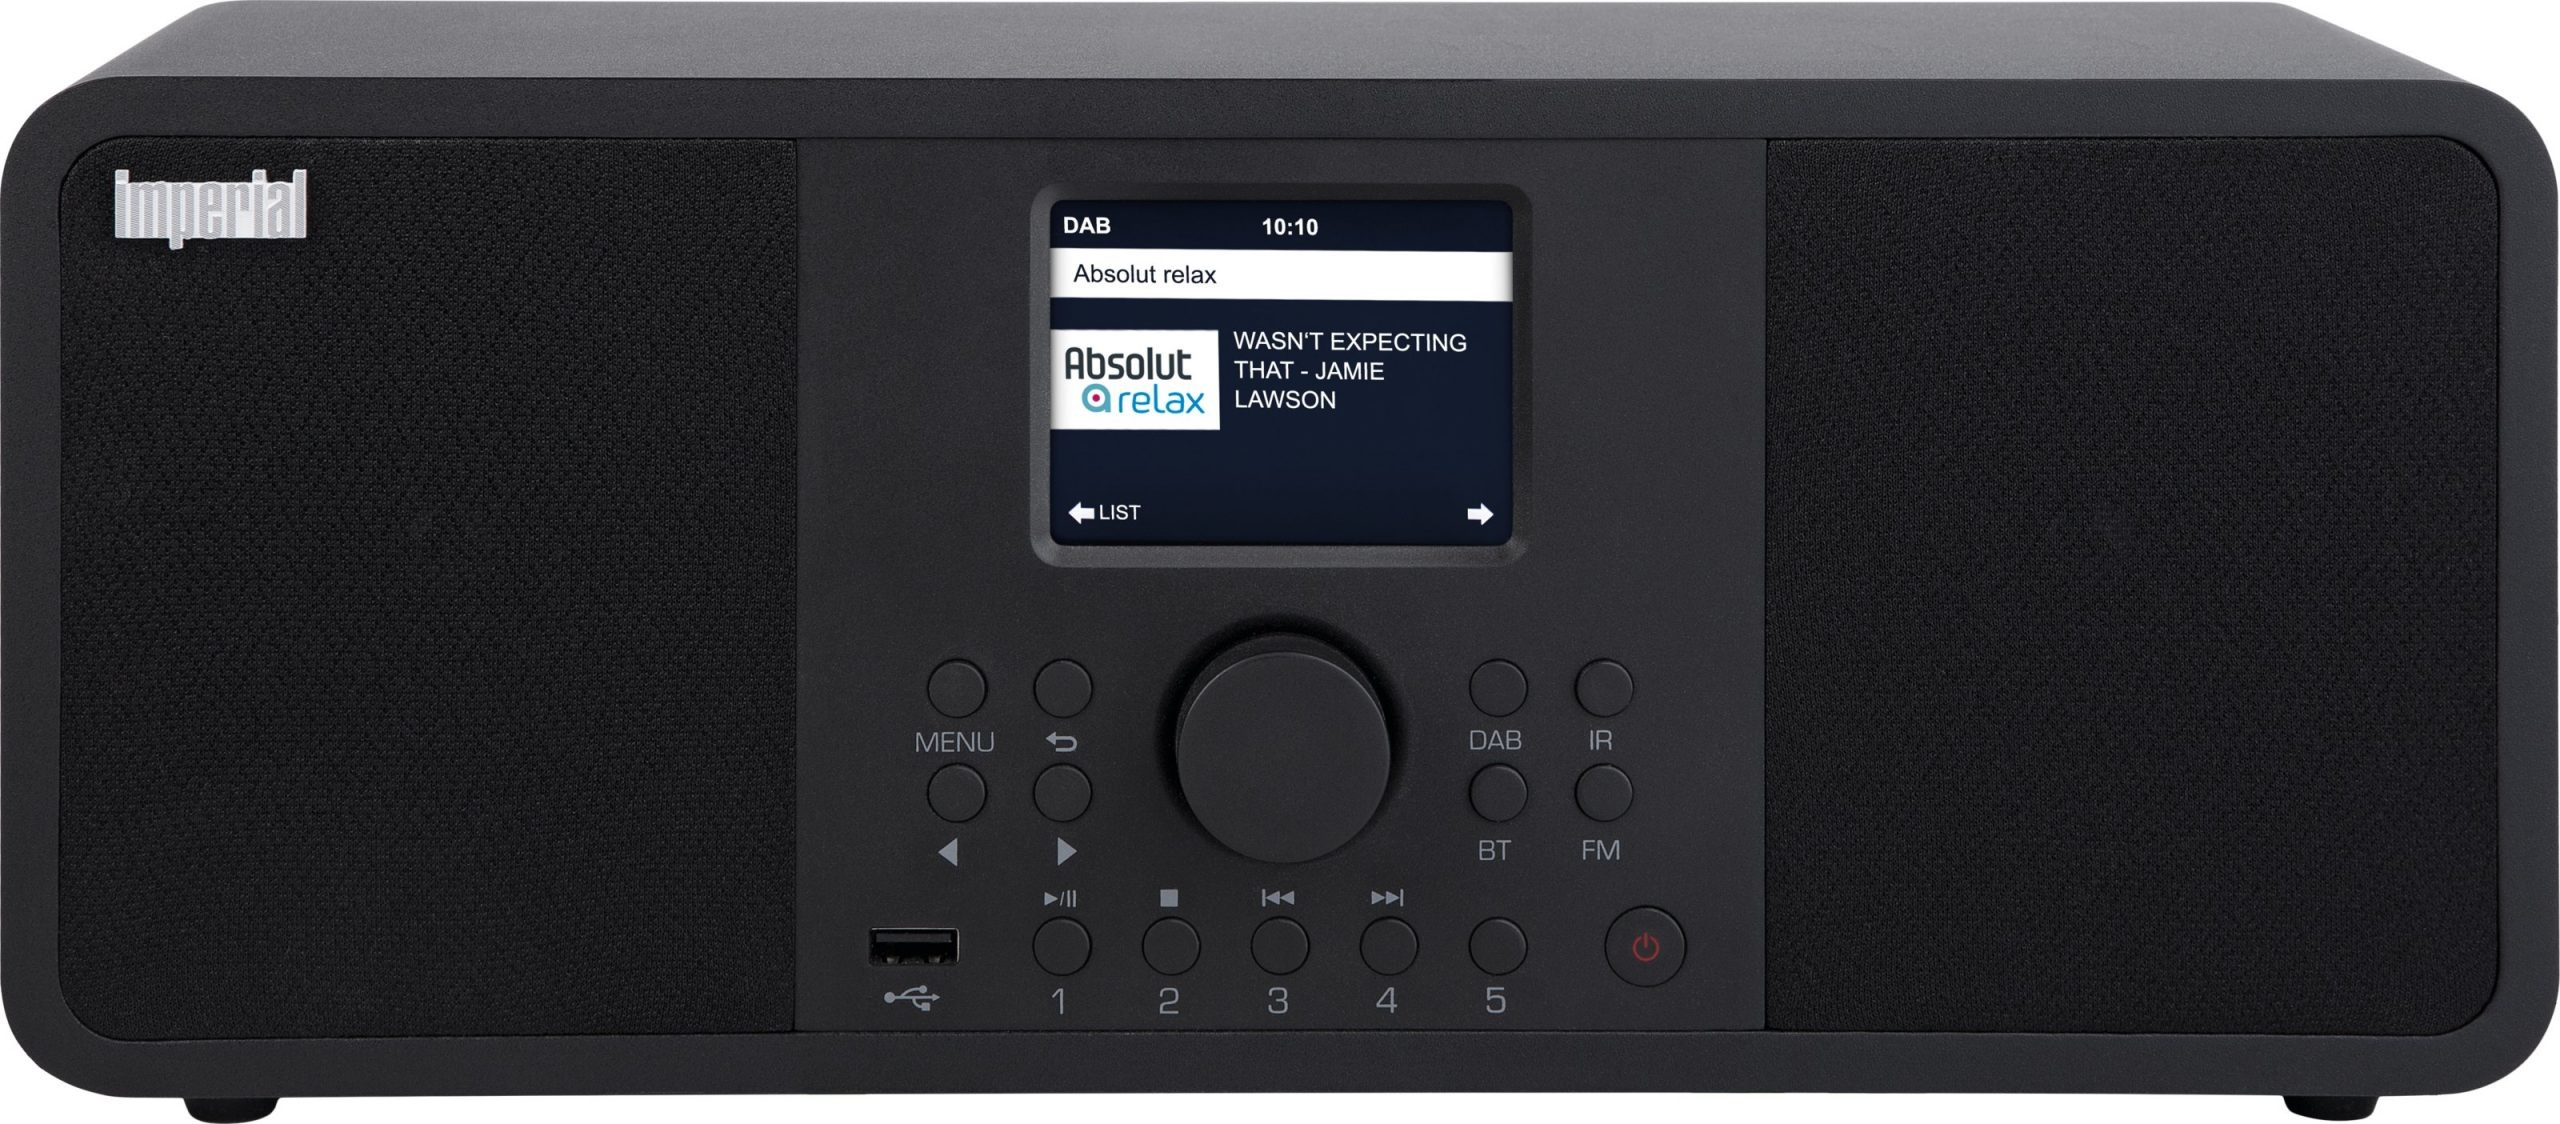 Foto van Imperial DABMAN i205 Hybride radio